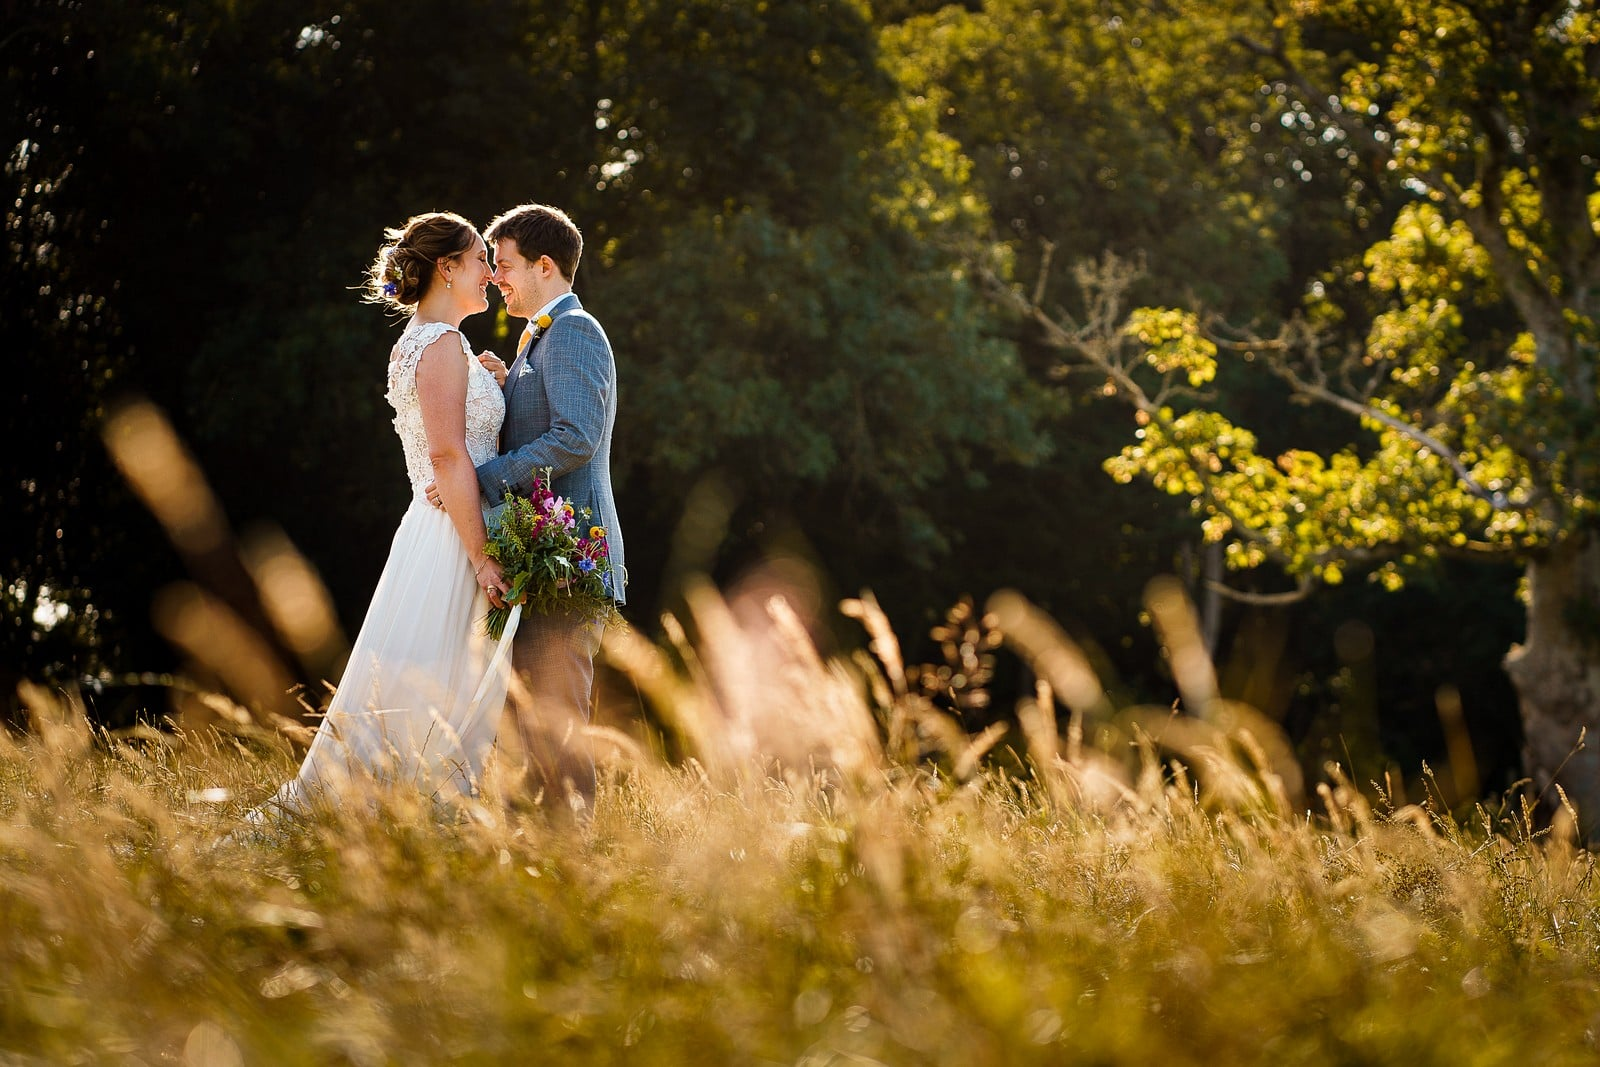 best of 2019 - wedding at Trewornan Manor 008